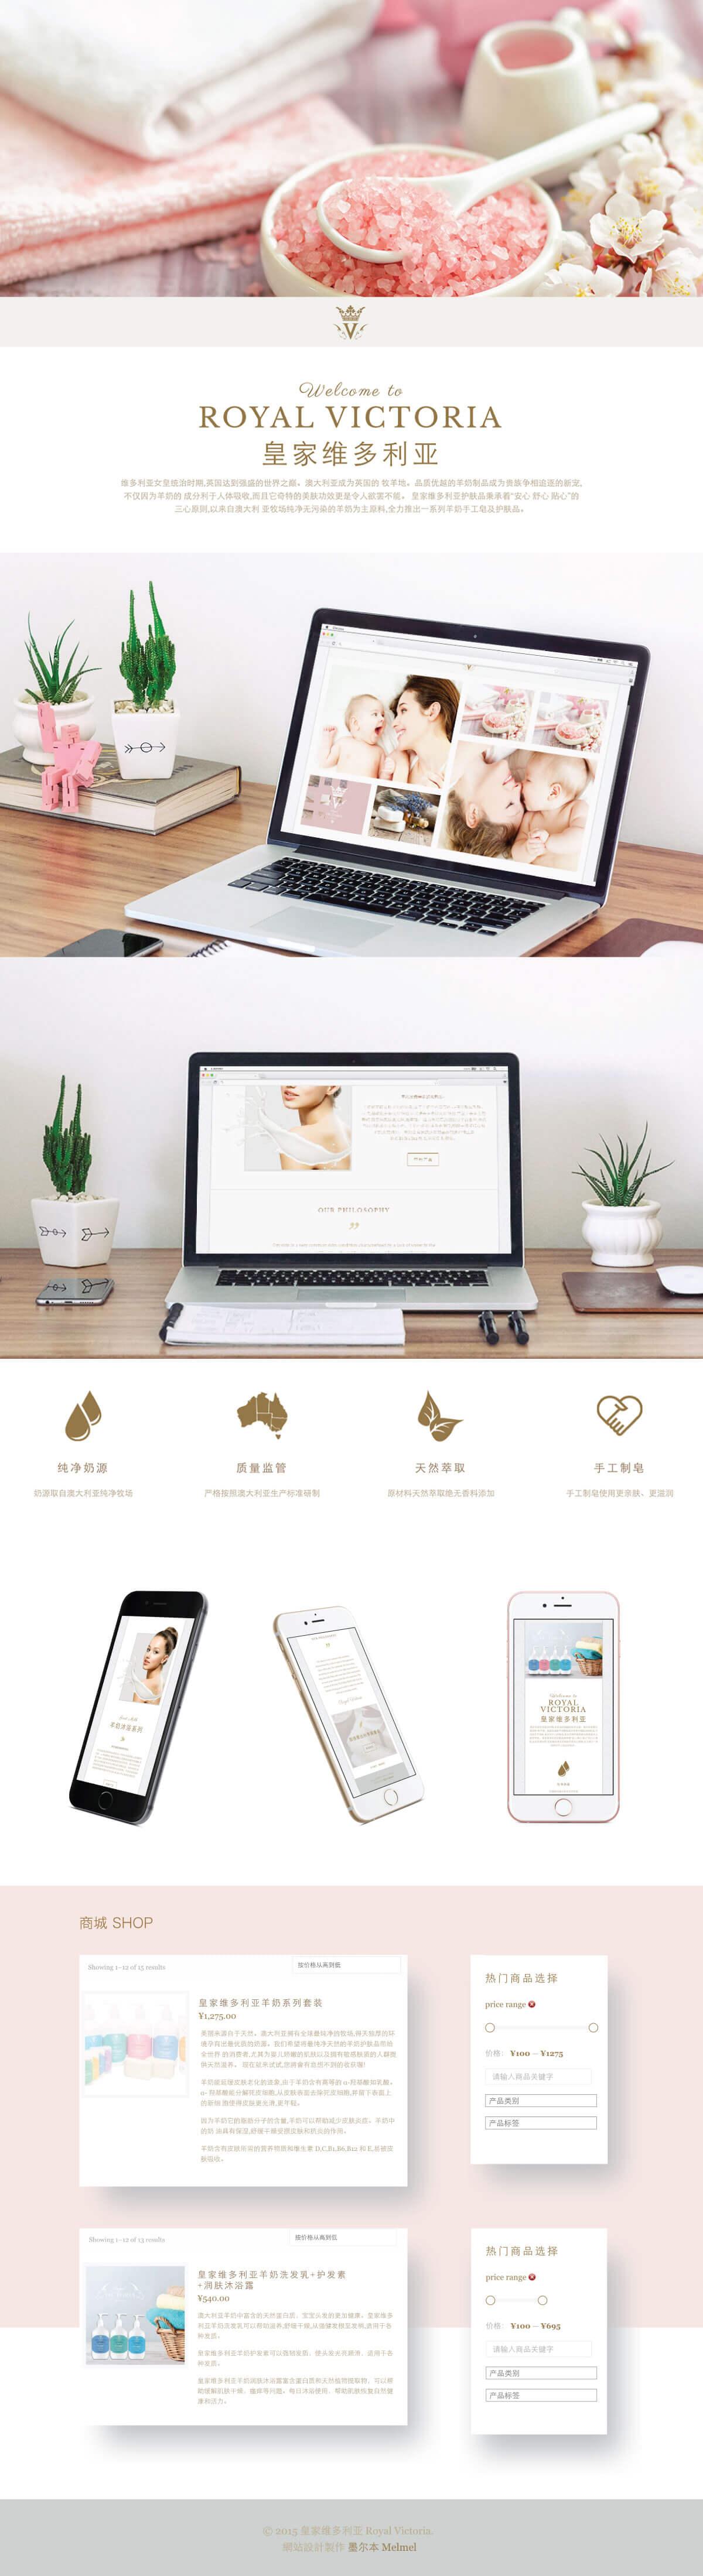 royal-victoria-website-display